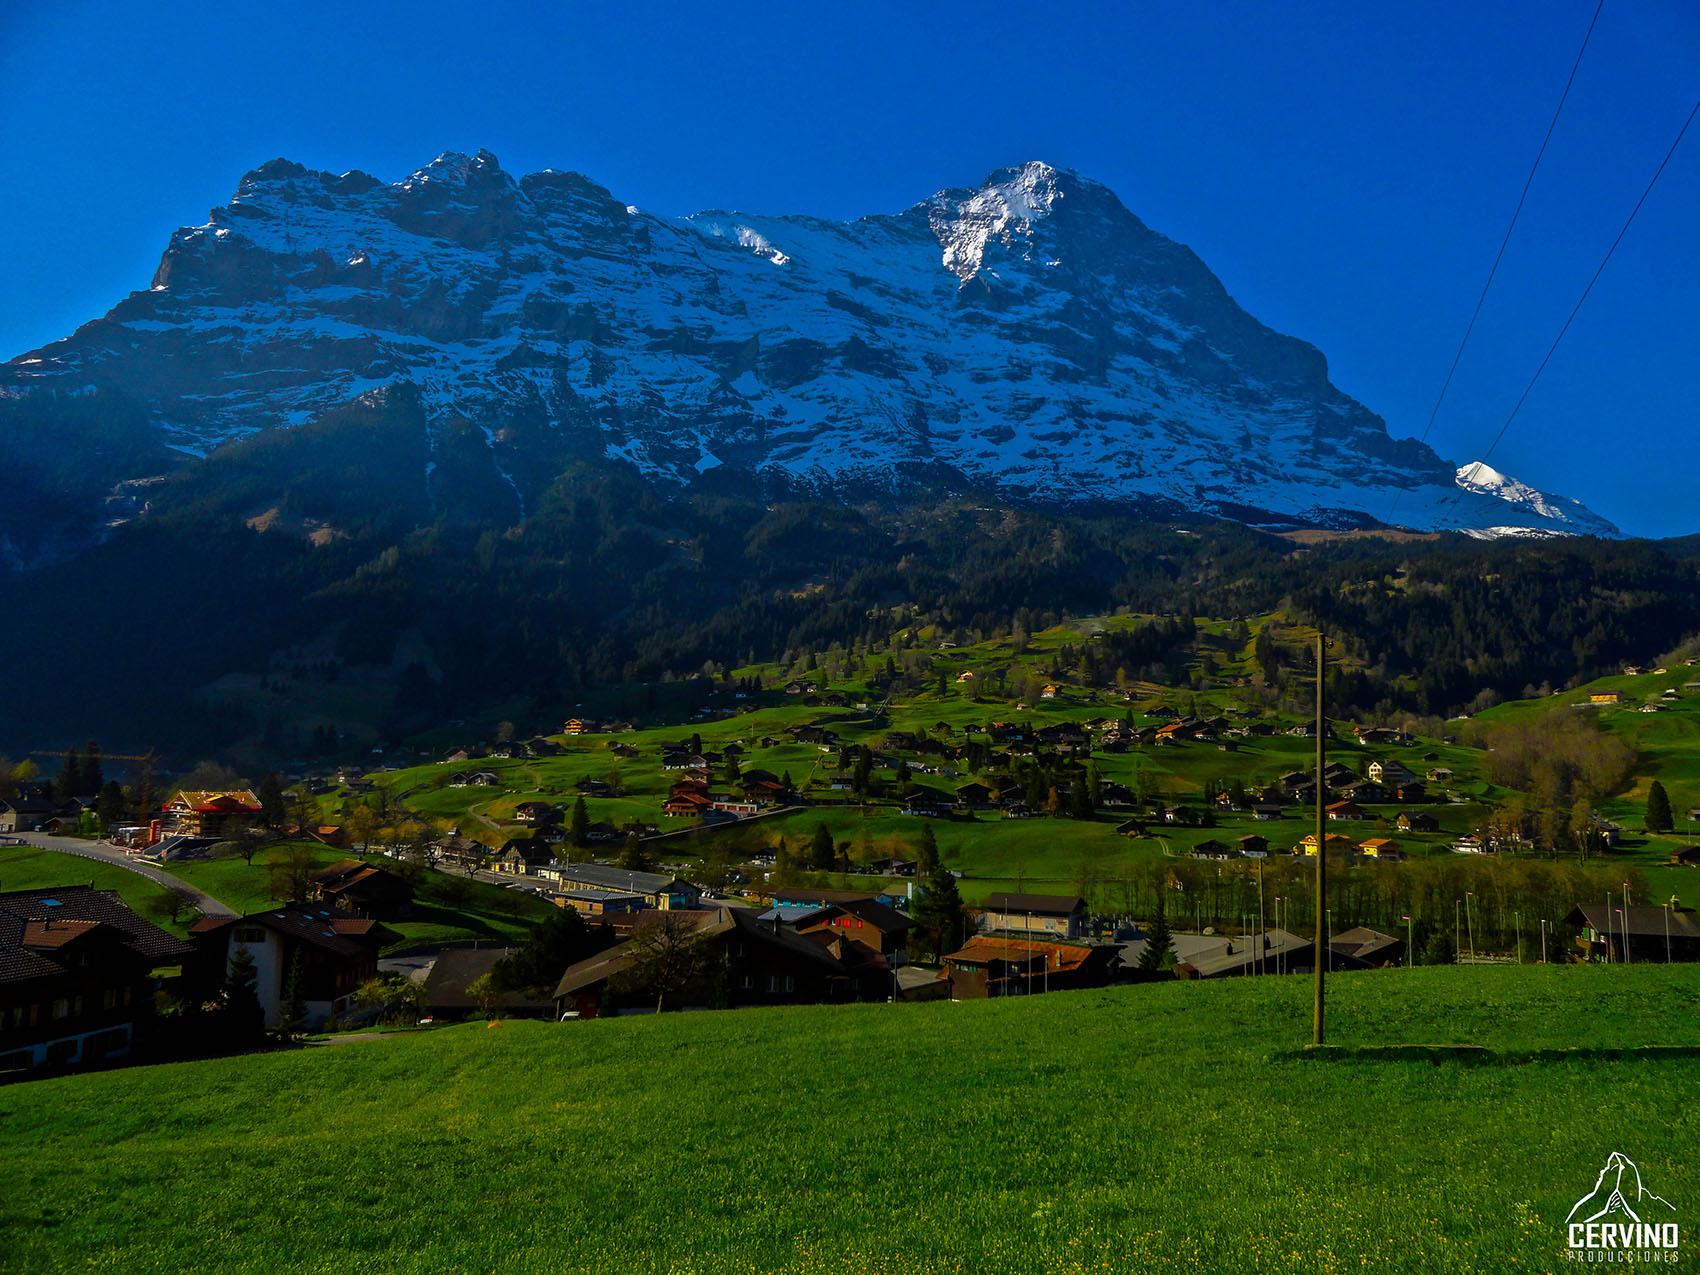 Portfolio_Cervino_2011_ Alpes_02